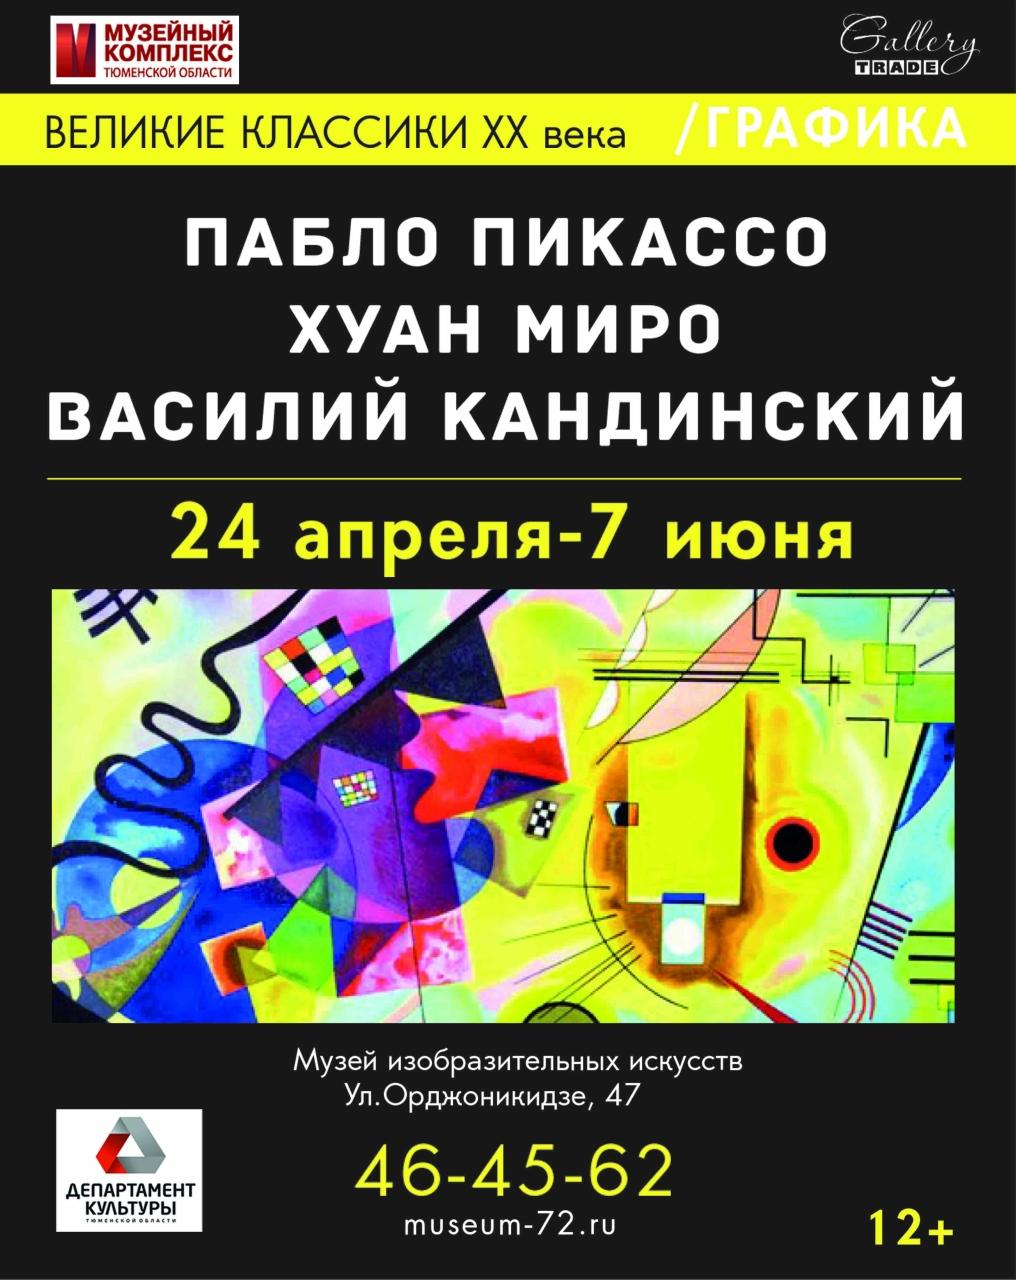 Пикассо, Кандинского и Миро покажут в музее ИЗО 2